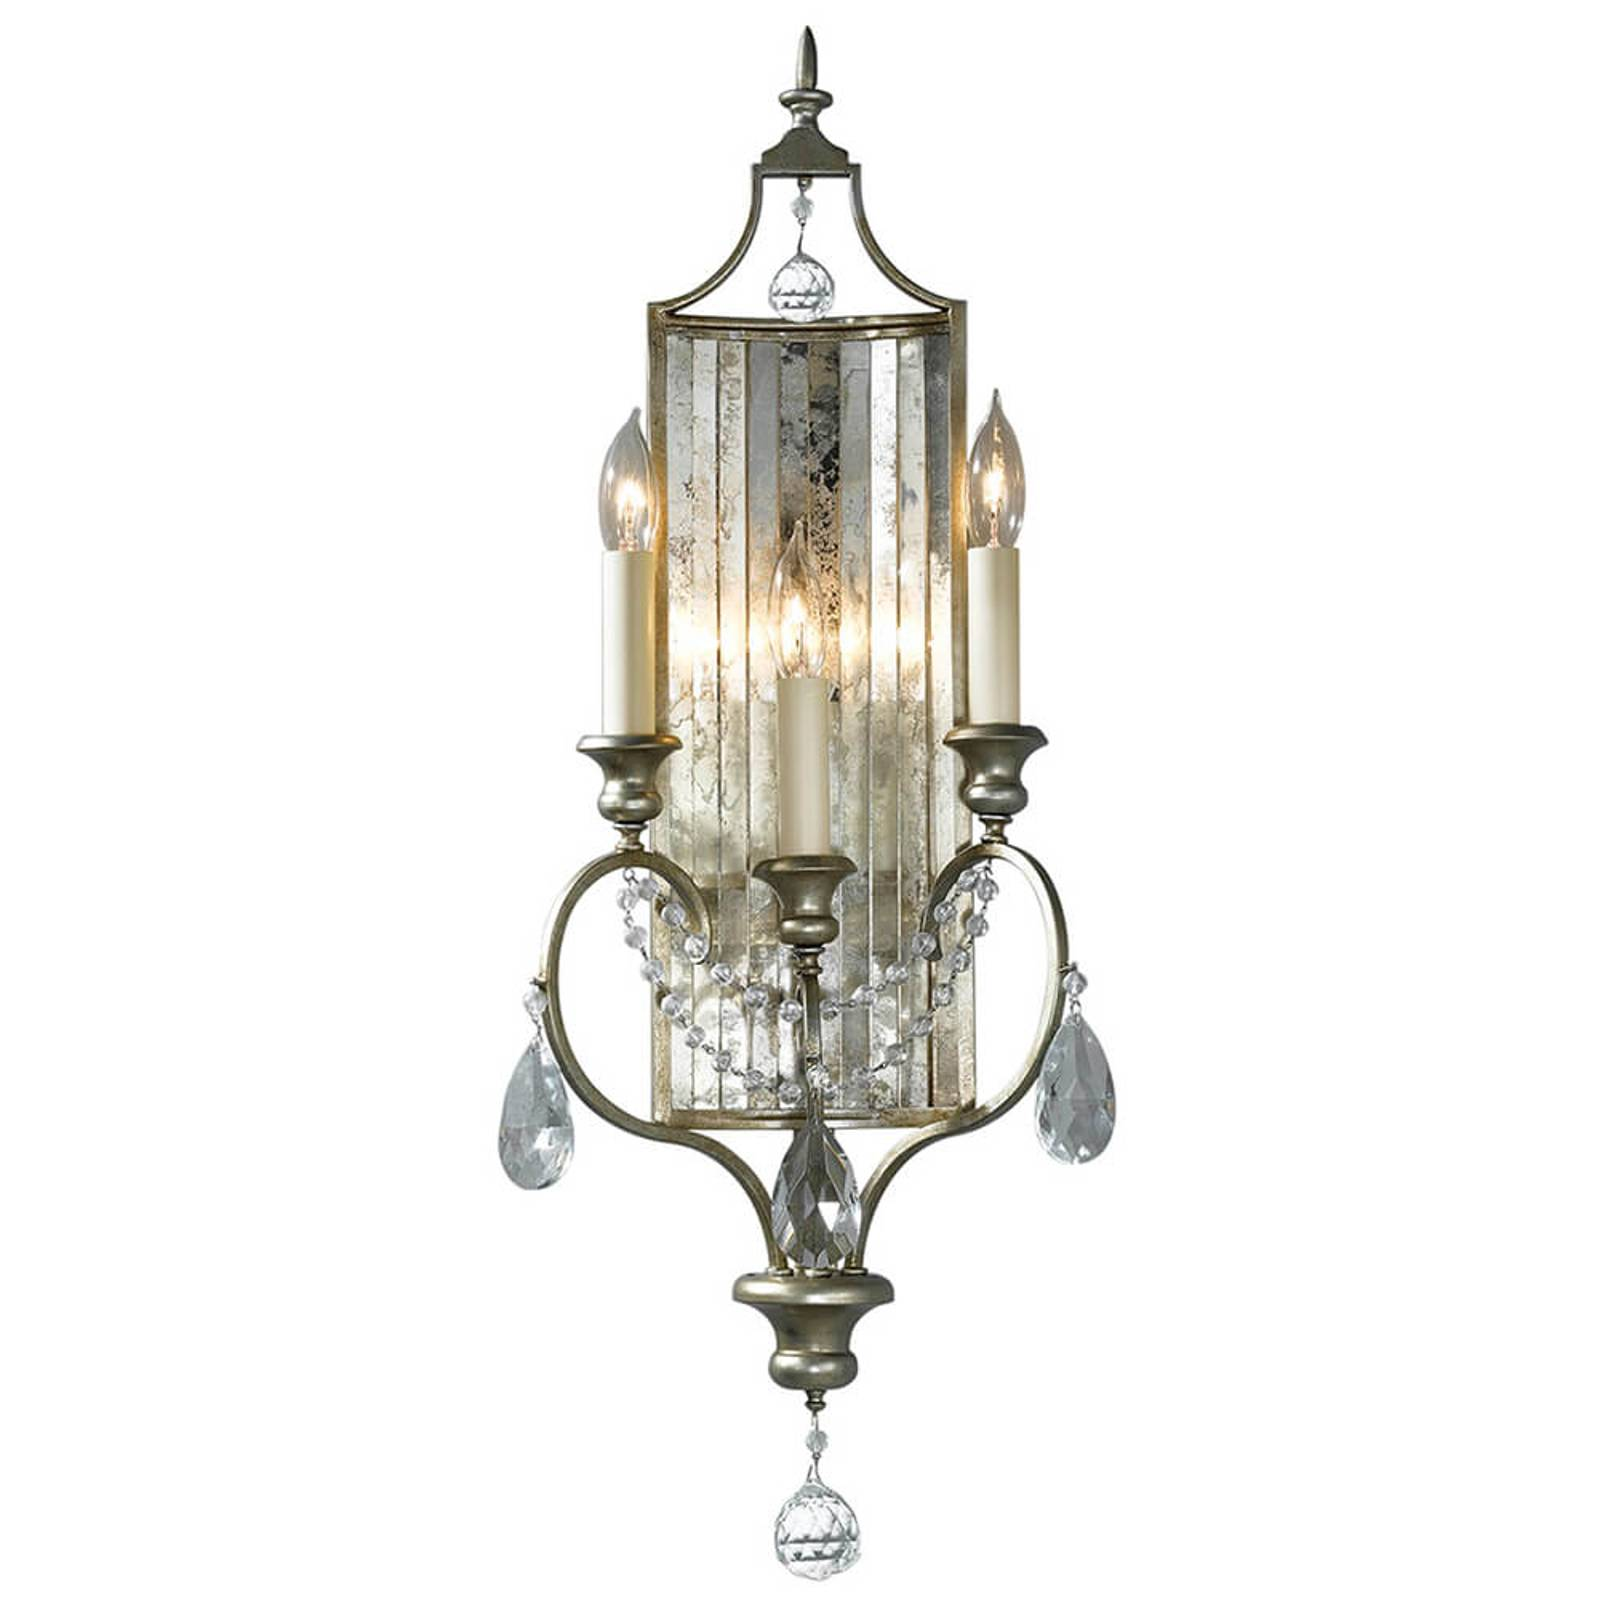 Wandlamp Gianna met drie lampjes